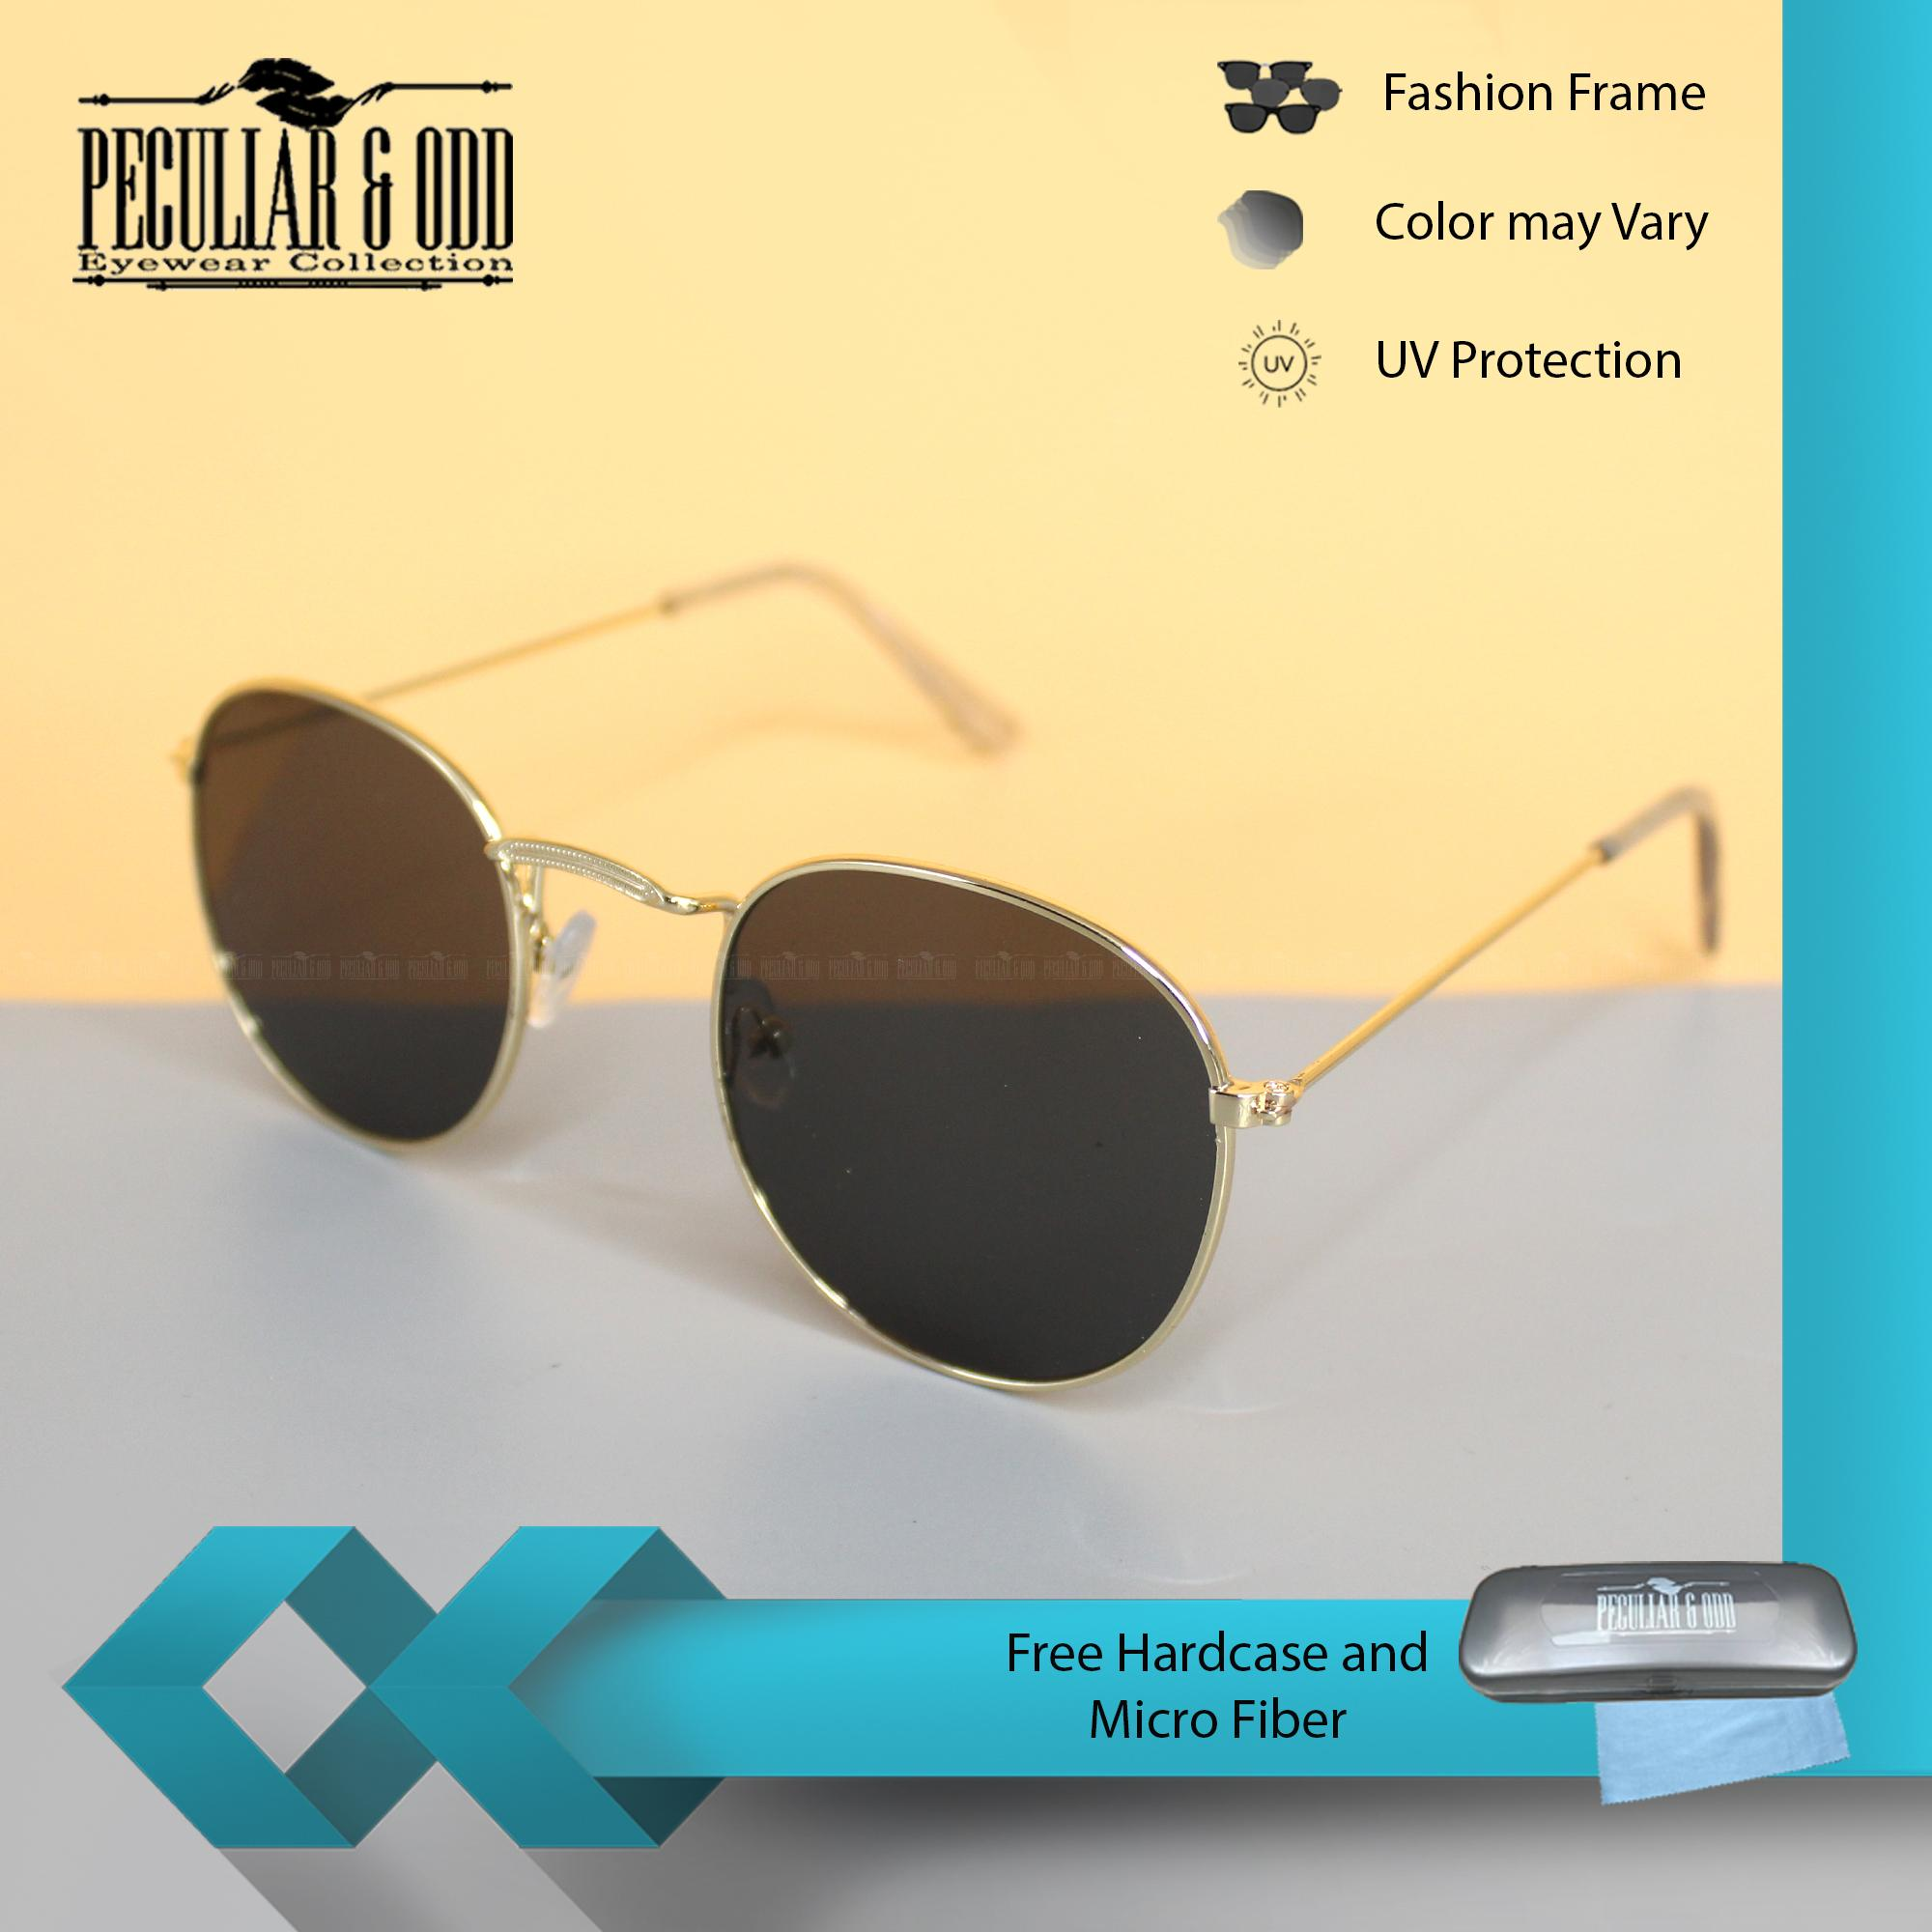 6017f91603 Peculiar Round 3447 GoldBlack in Gold Frame and Black Flash Lens Sunglasses  in Lightweight Metallic Frame Unisex